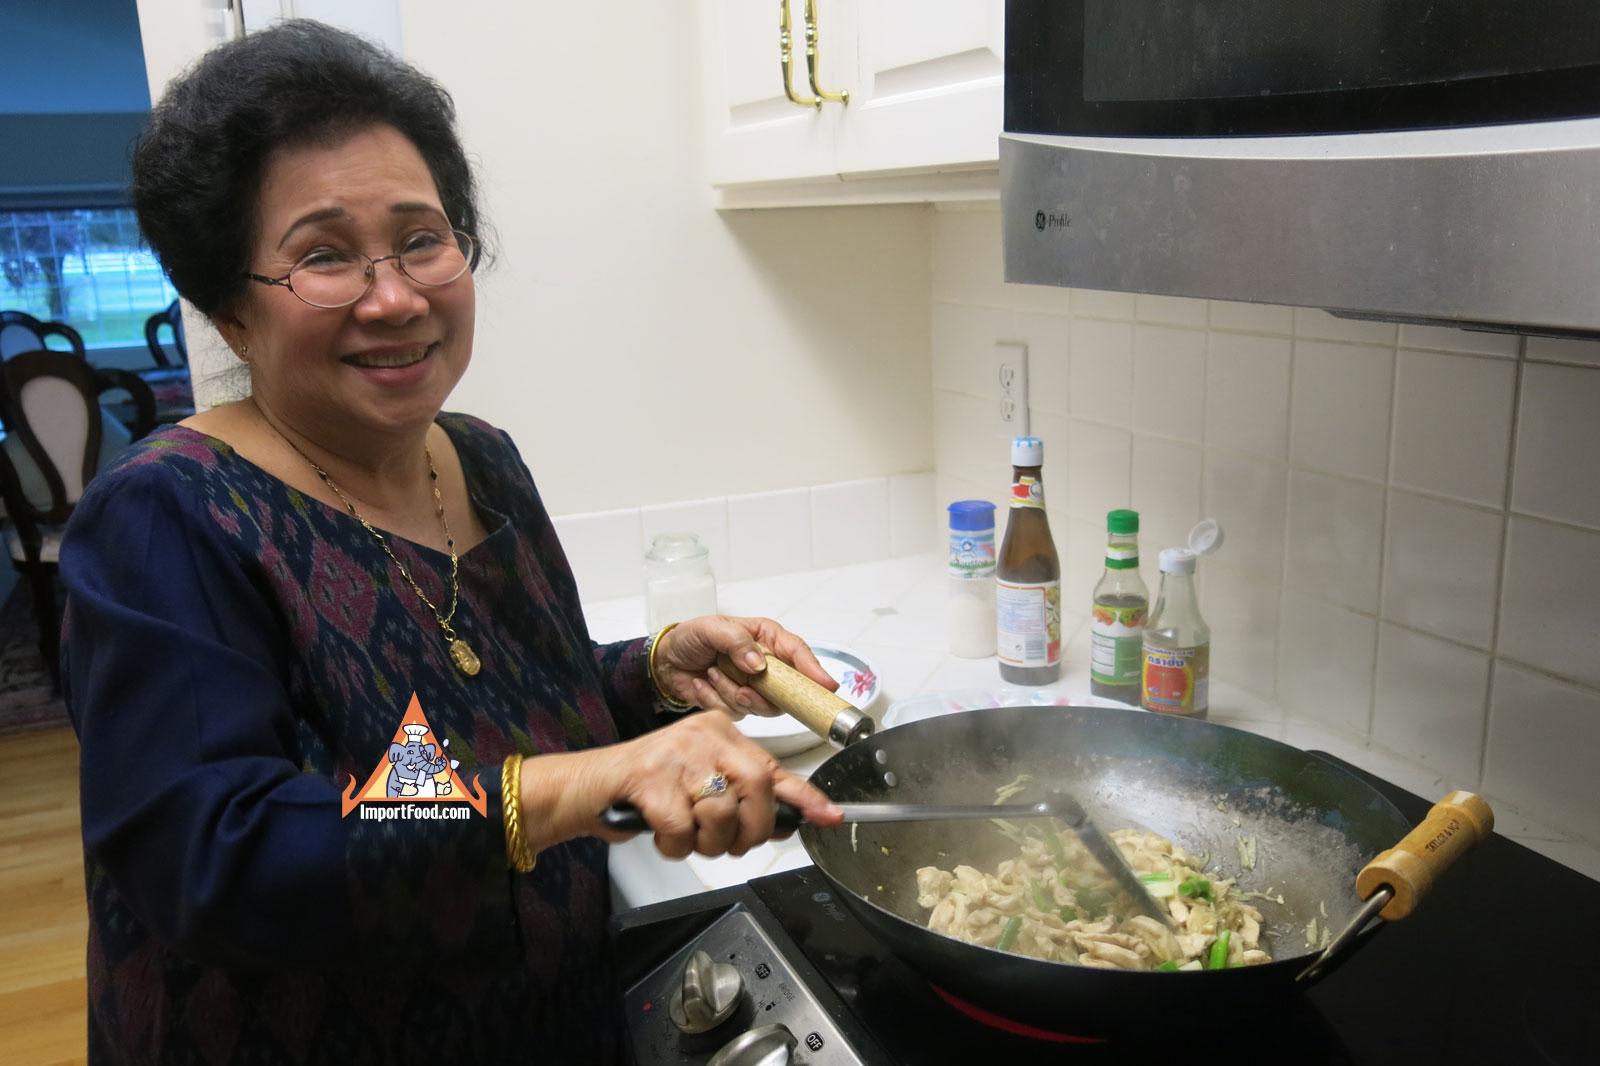 bed7947931f1e2cb8064837426f21485 Recipe Ginger Chicken, 'Gai Pad Khing' :: ImportFood